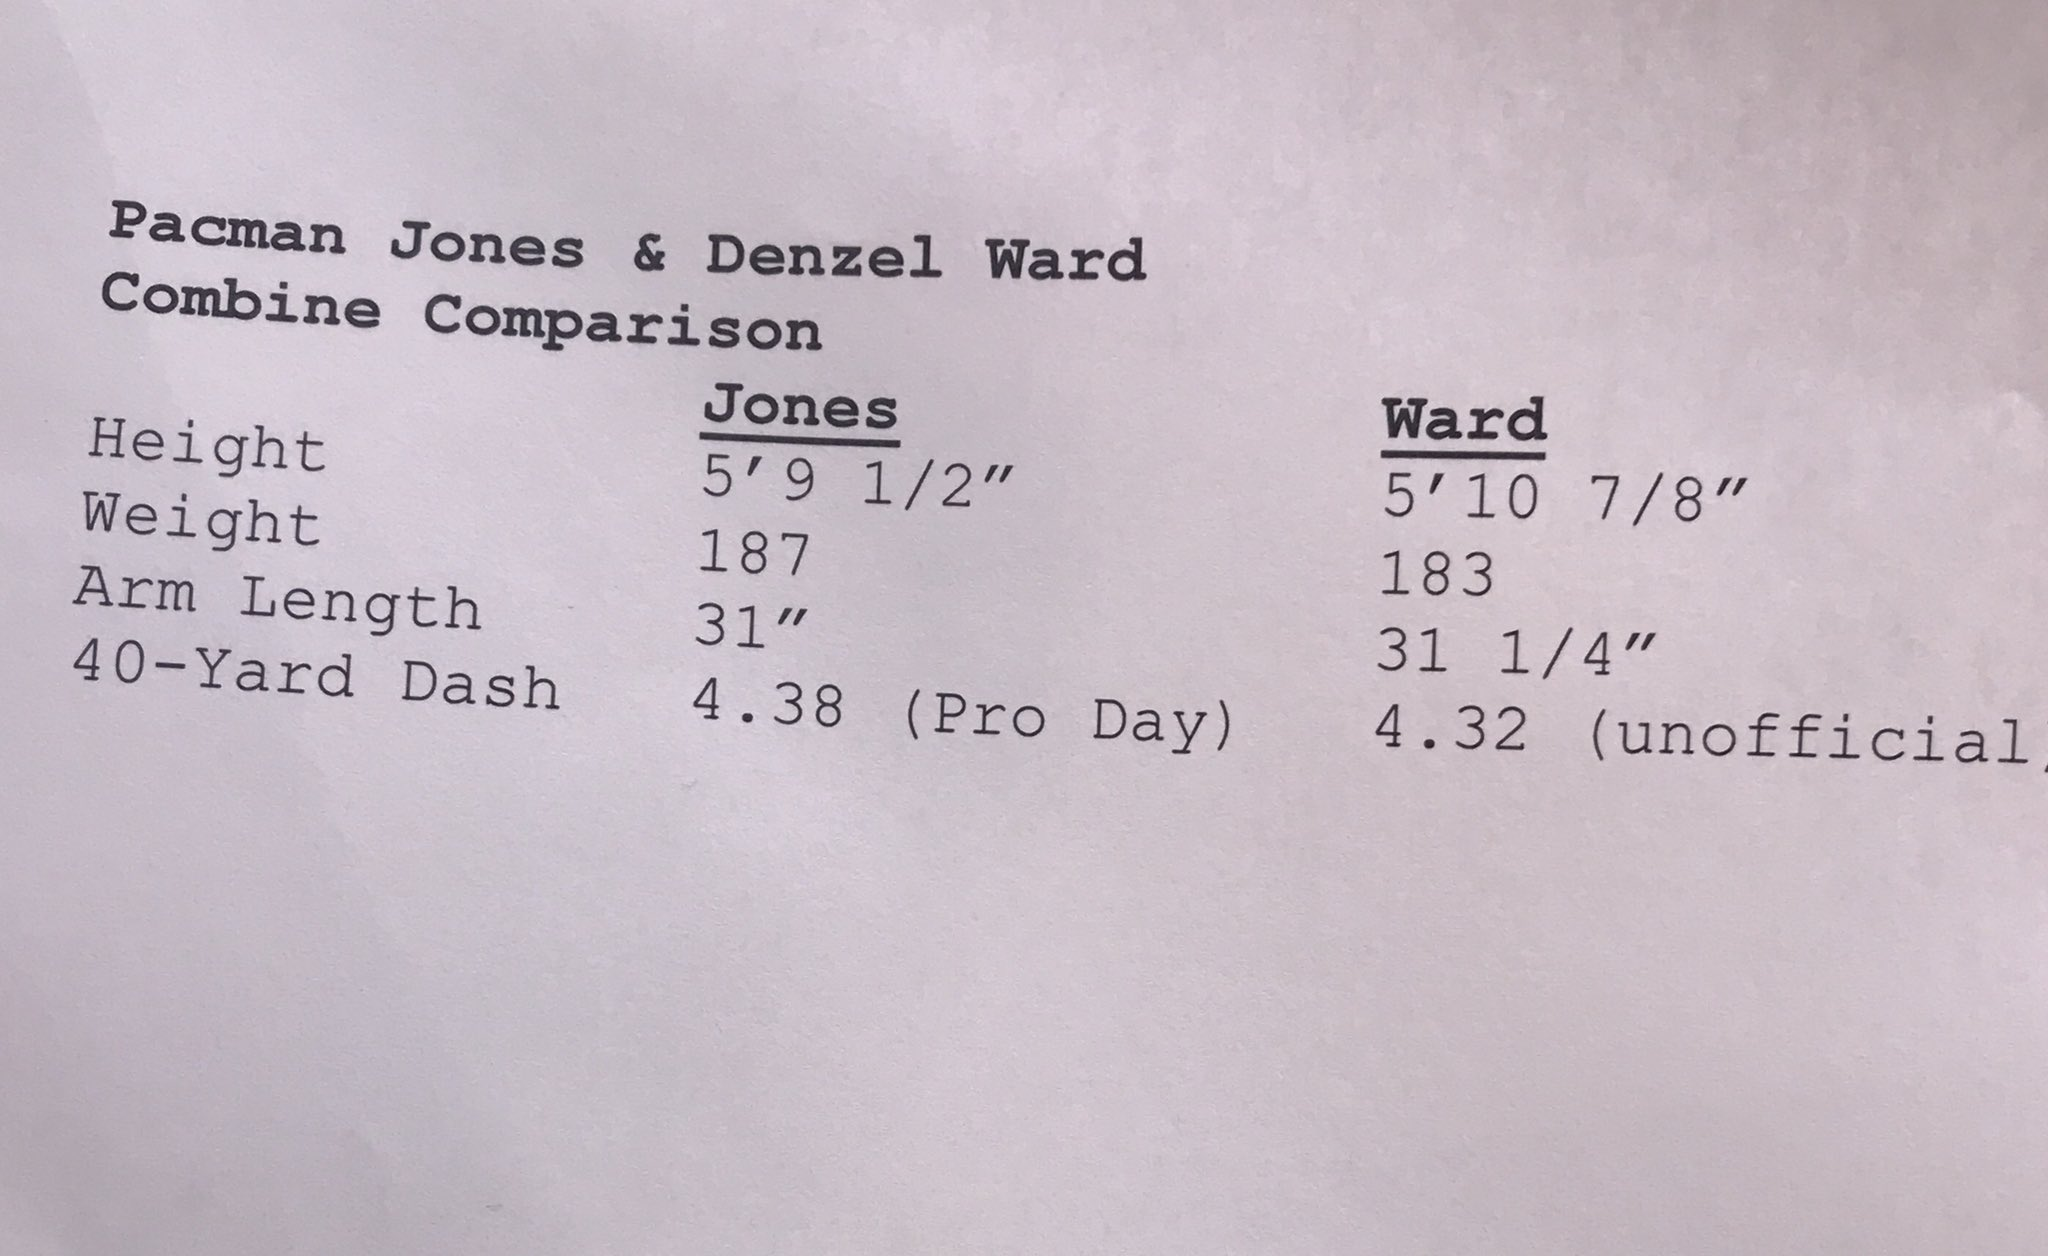 I ❤️ Denzel Ward. Here's my comp: https://t.co/zwt5dnlRbo